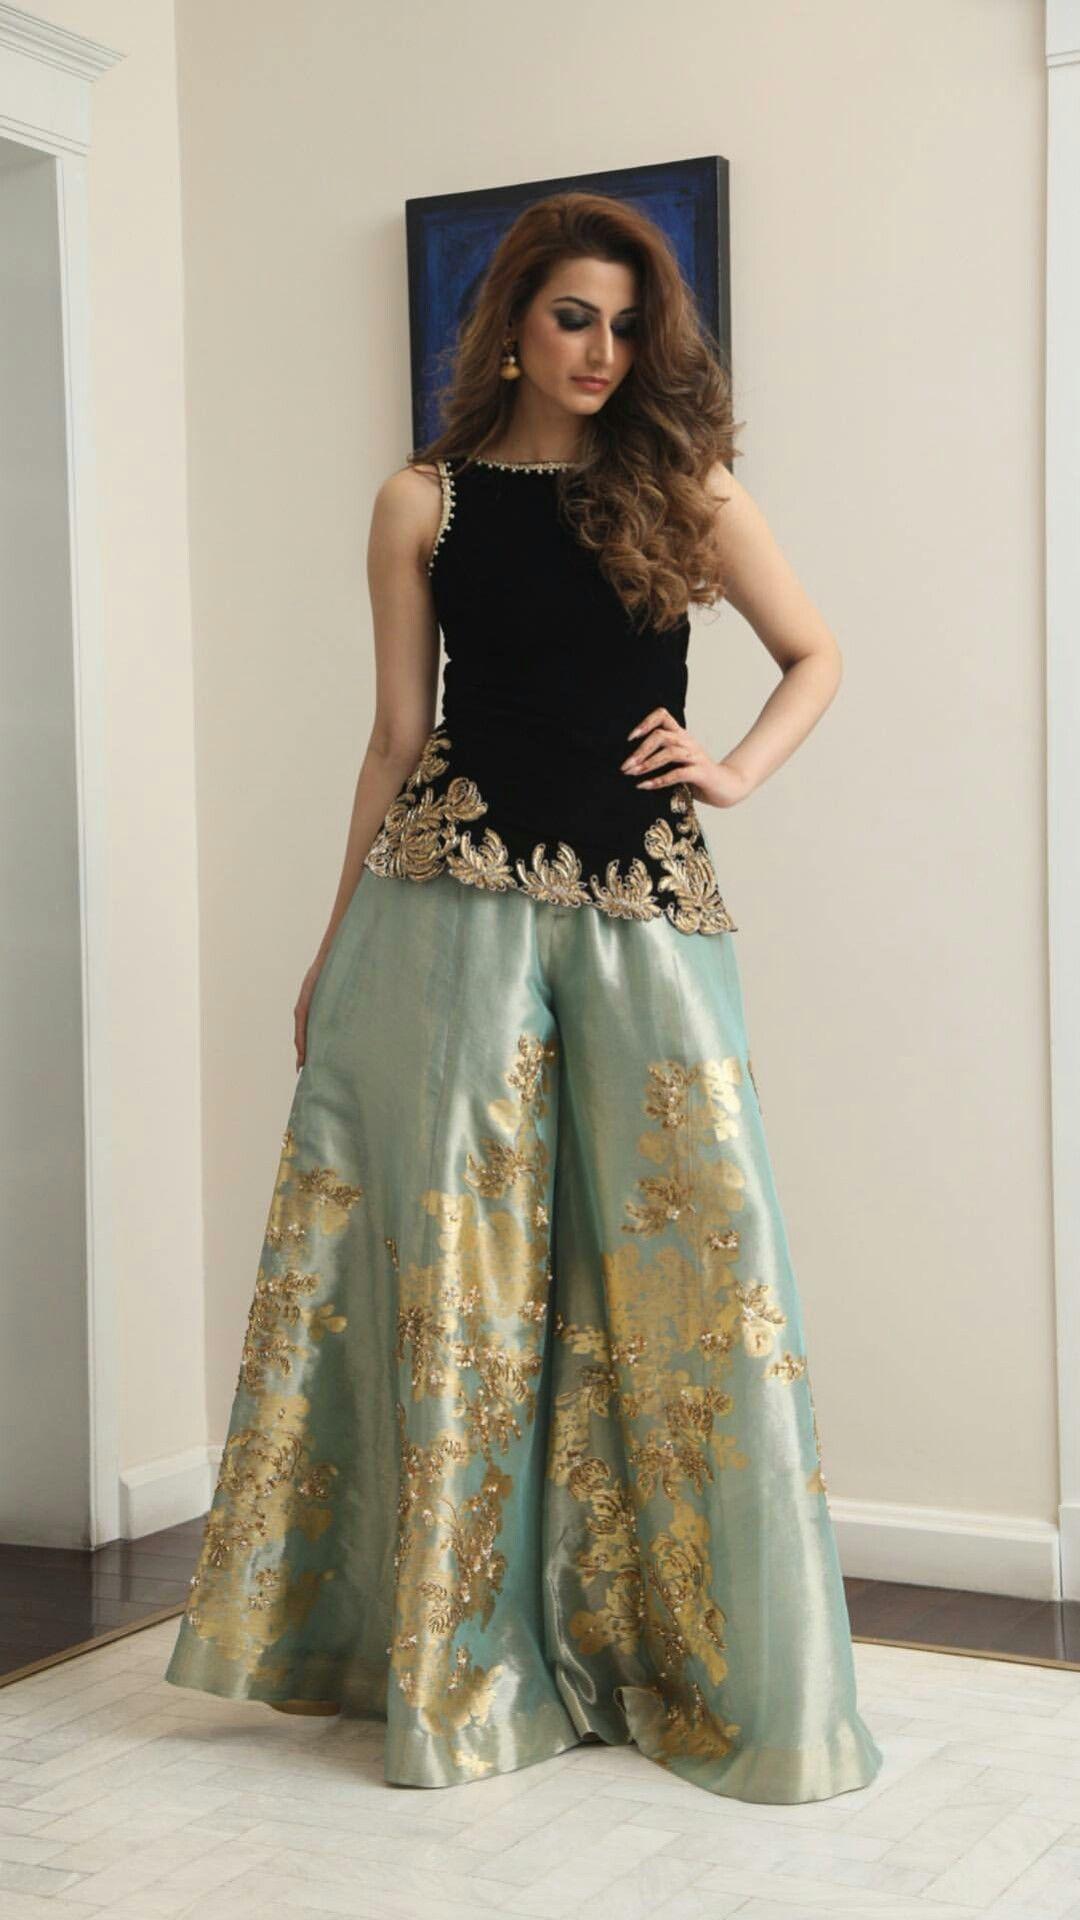 Sillk by fawad khan couture pinterest indian wear pakistani